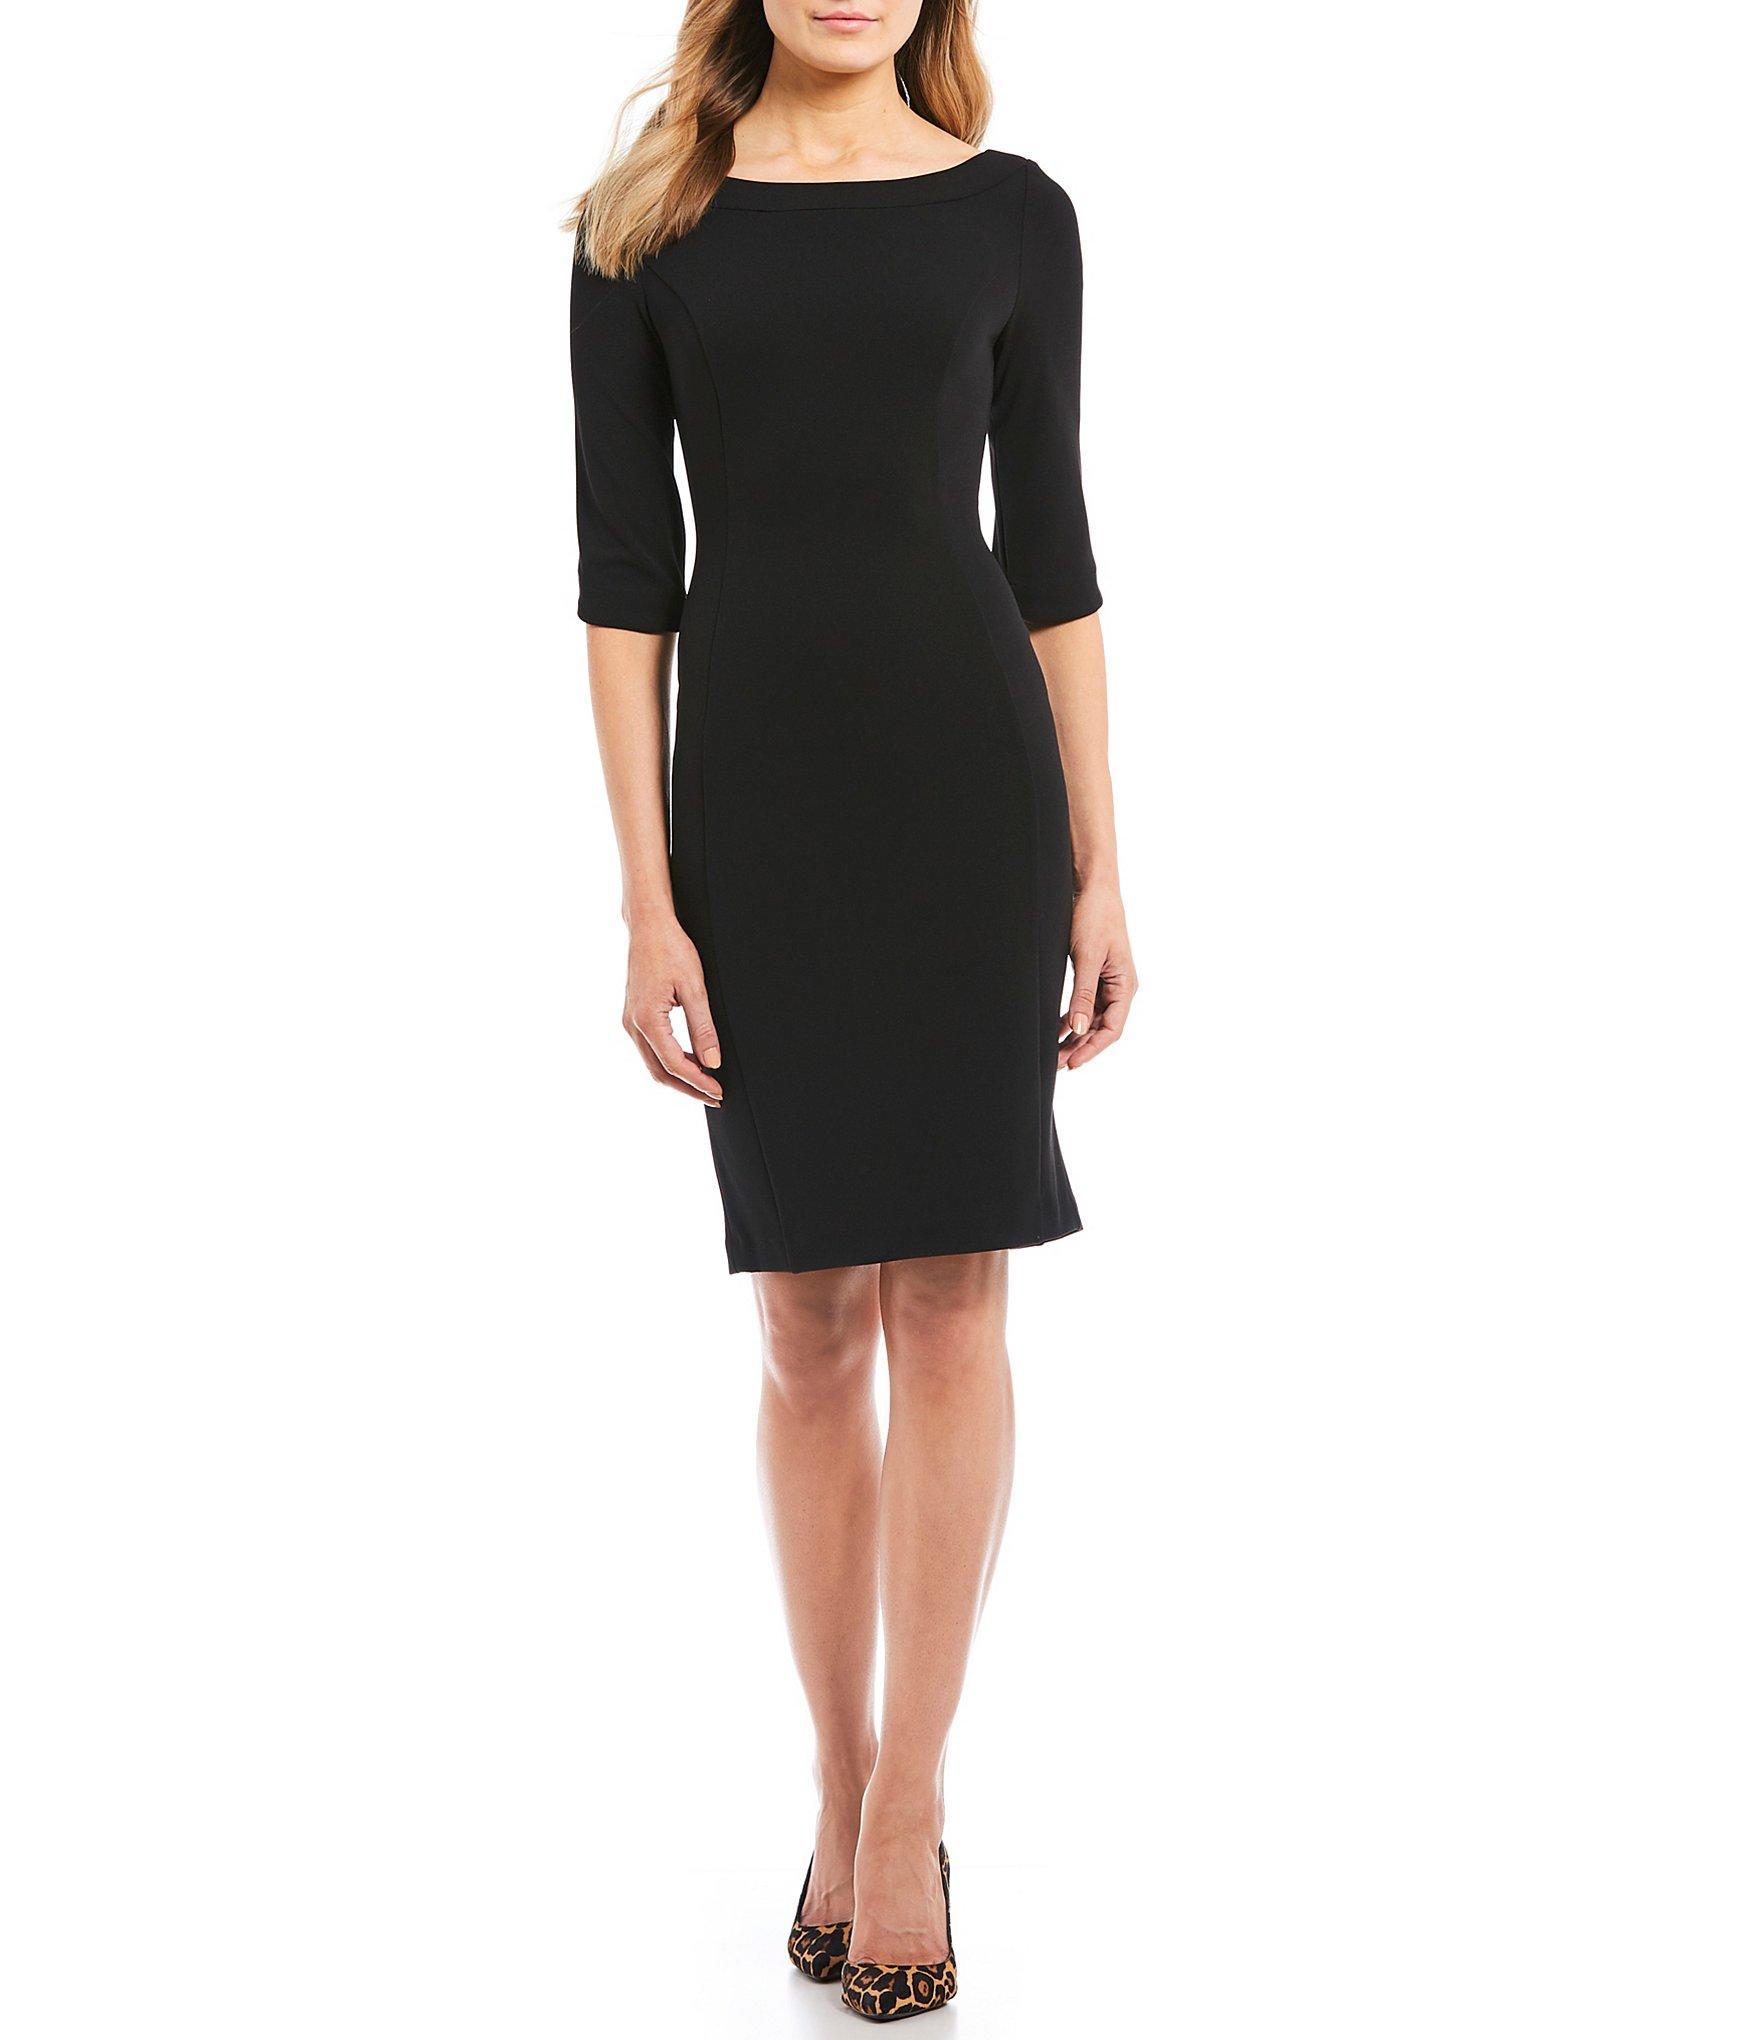 8540146b9a0 Lyst - Calvin Klein Boat Neck Tulip Sleeve Sheath Dress in Black